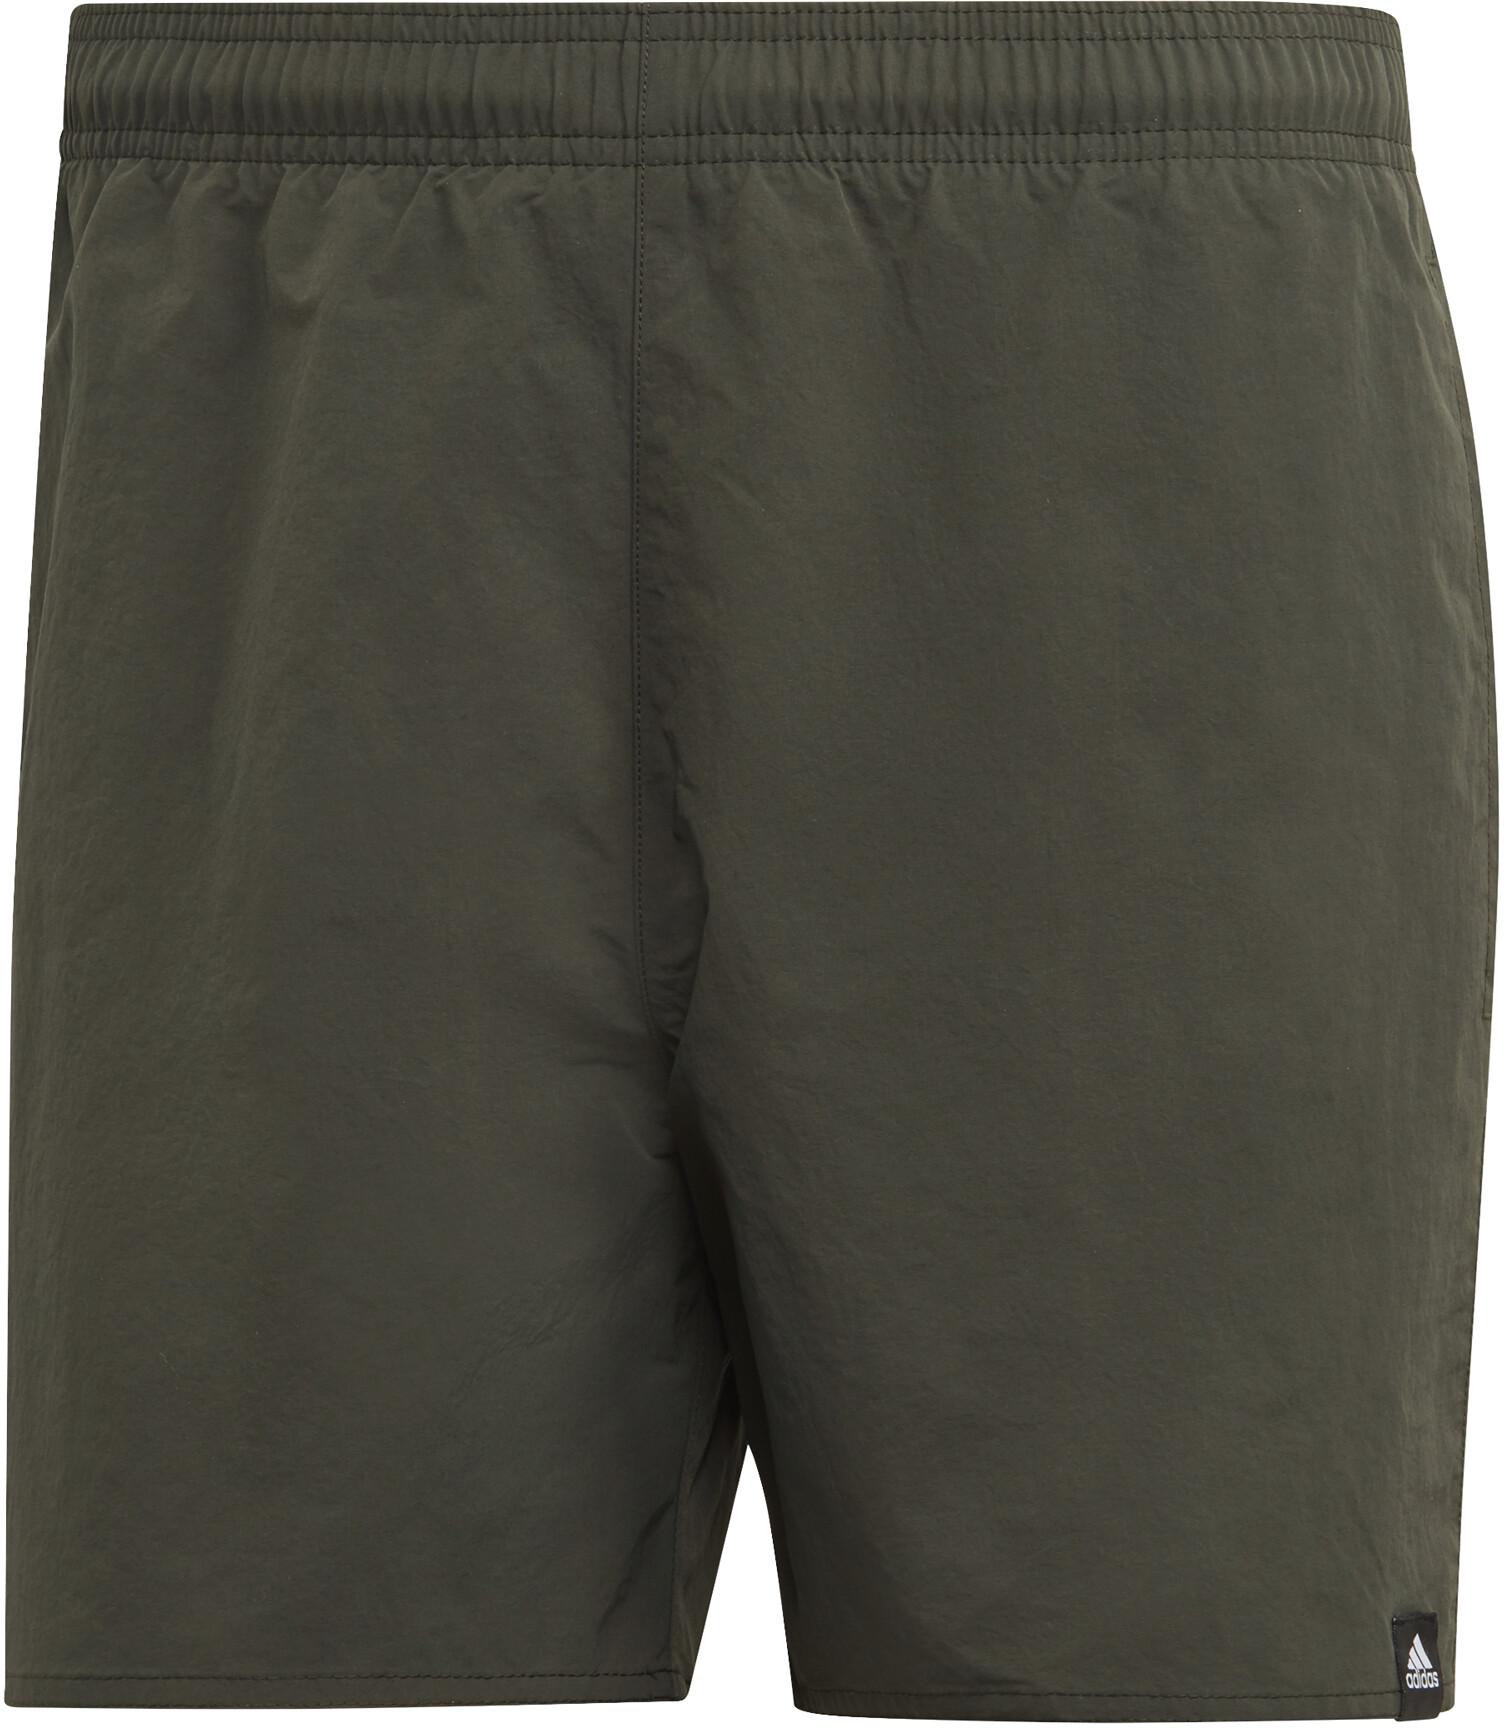 Boutique en ligne b1a1e 20574 adidas Solid SL Pantalones cortos Hombre, legend earth